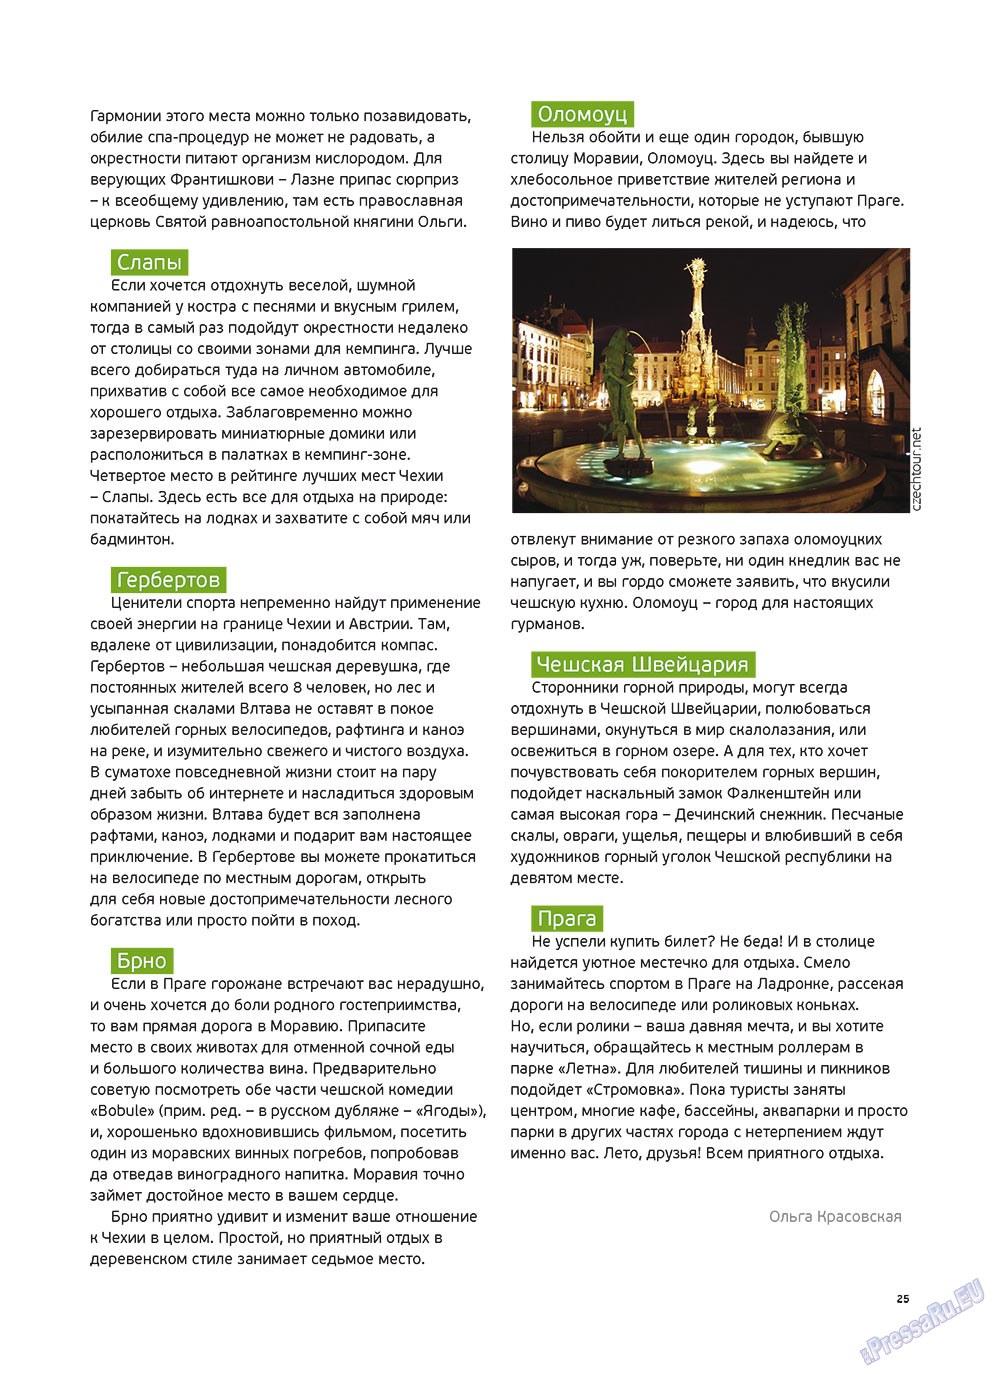 Артек (журнал). 2012 год, номер 2, стр. 27